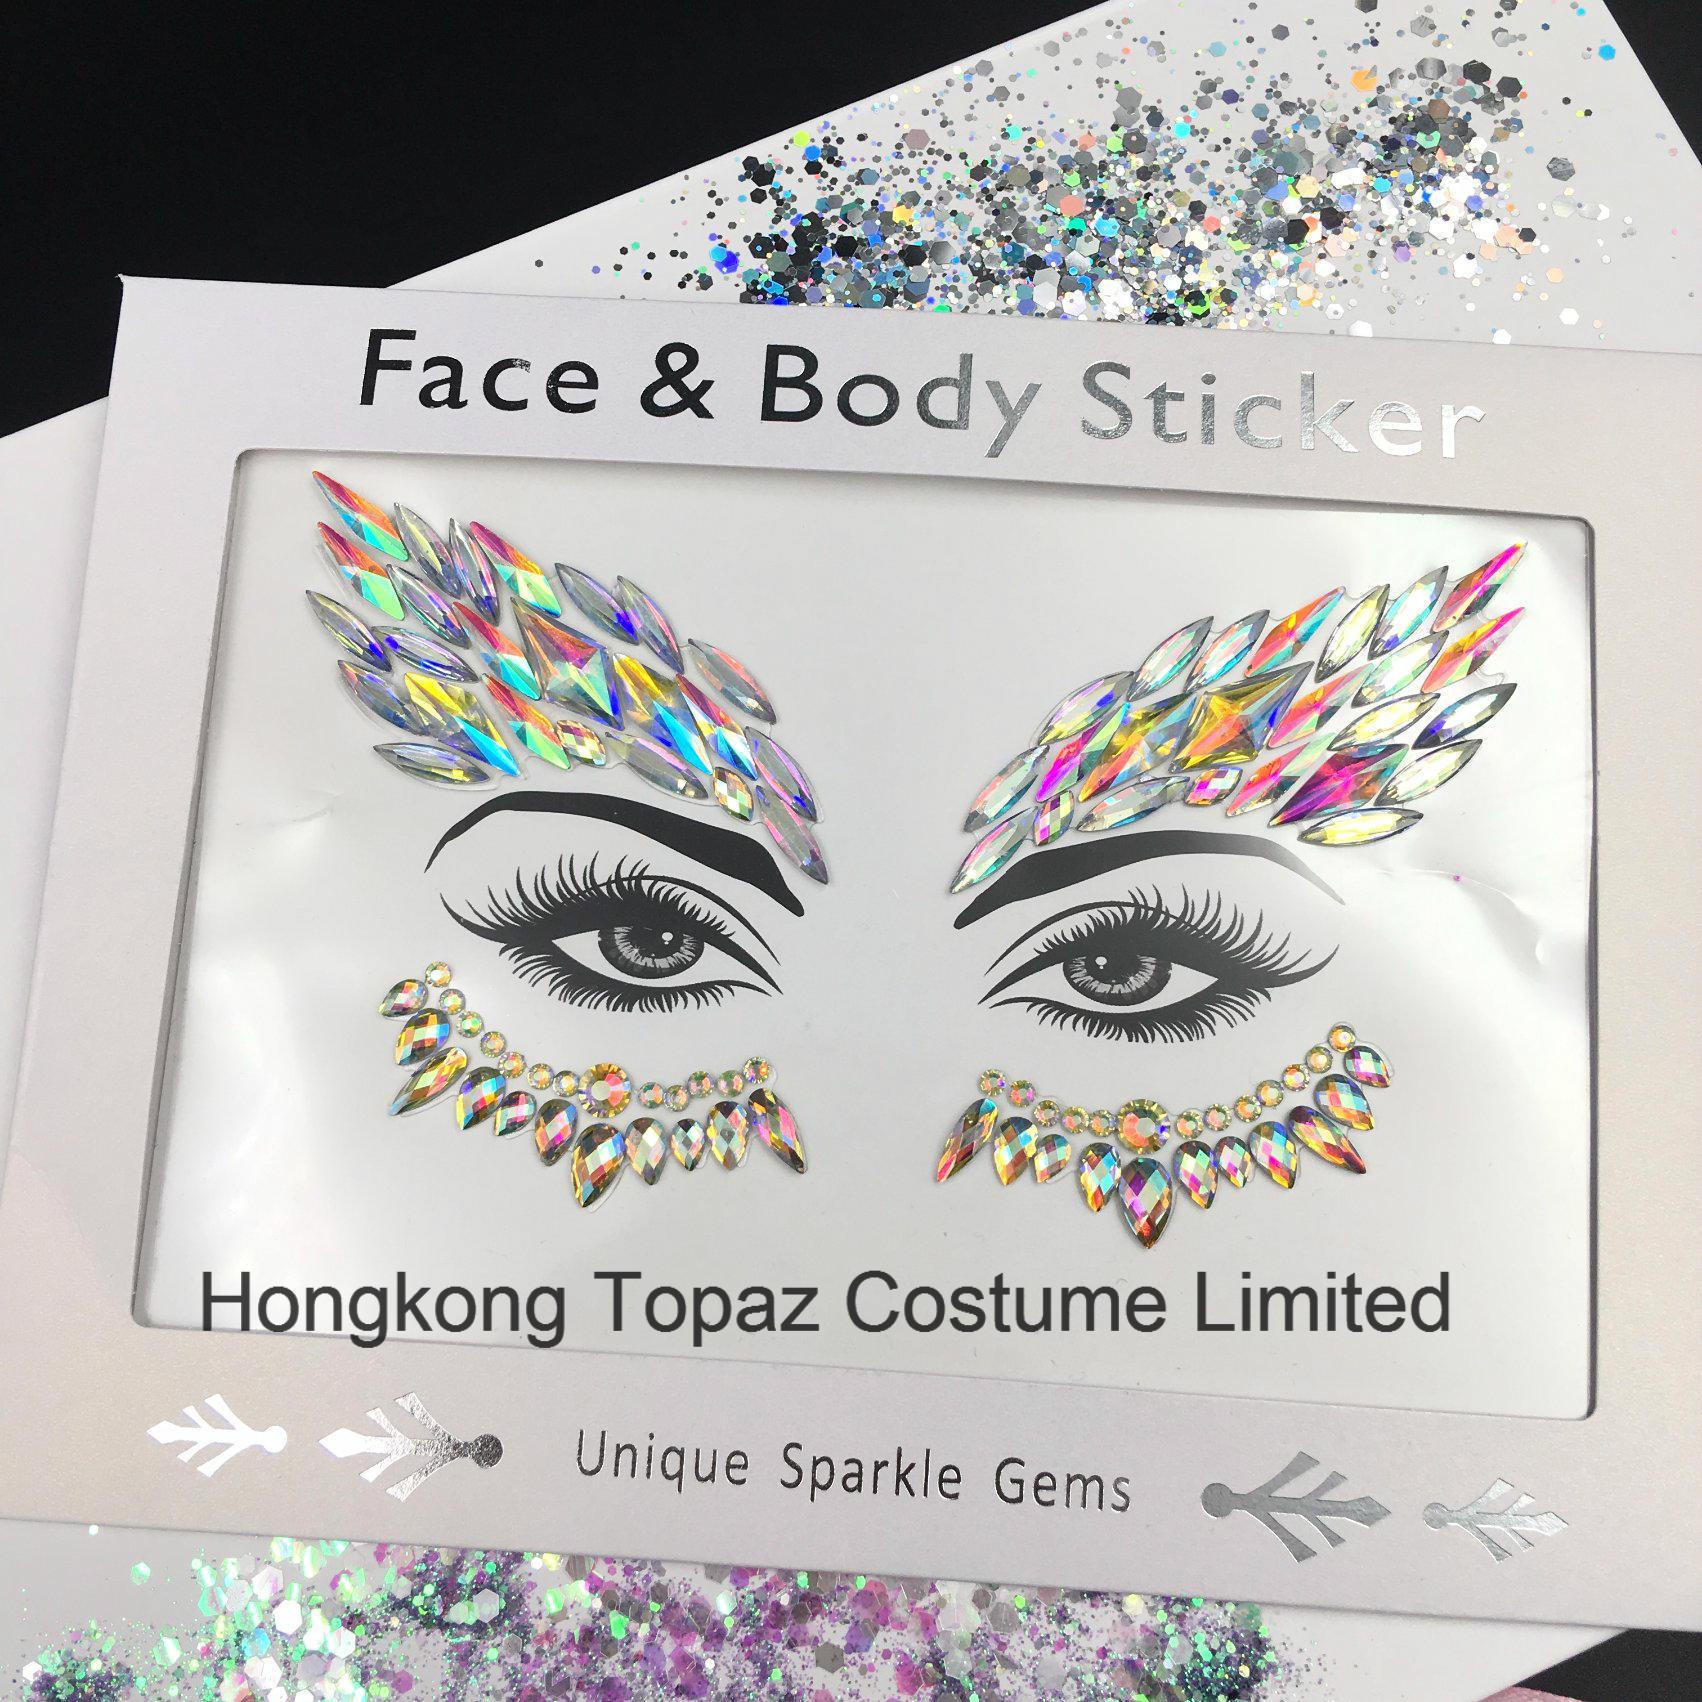 China 2018topaz popular acrylic rhinestone chest stickers body jewels face stickers e03 china body stickers body jewels sticker